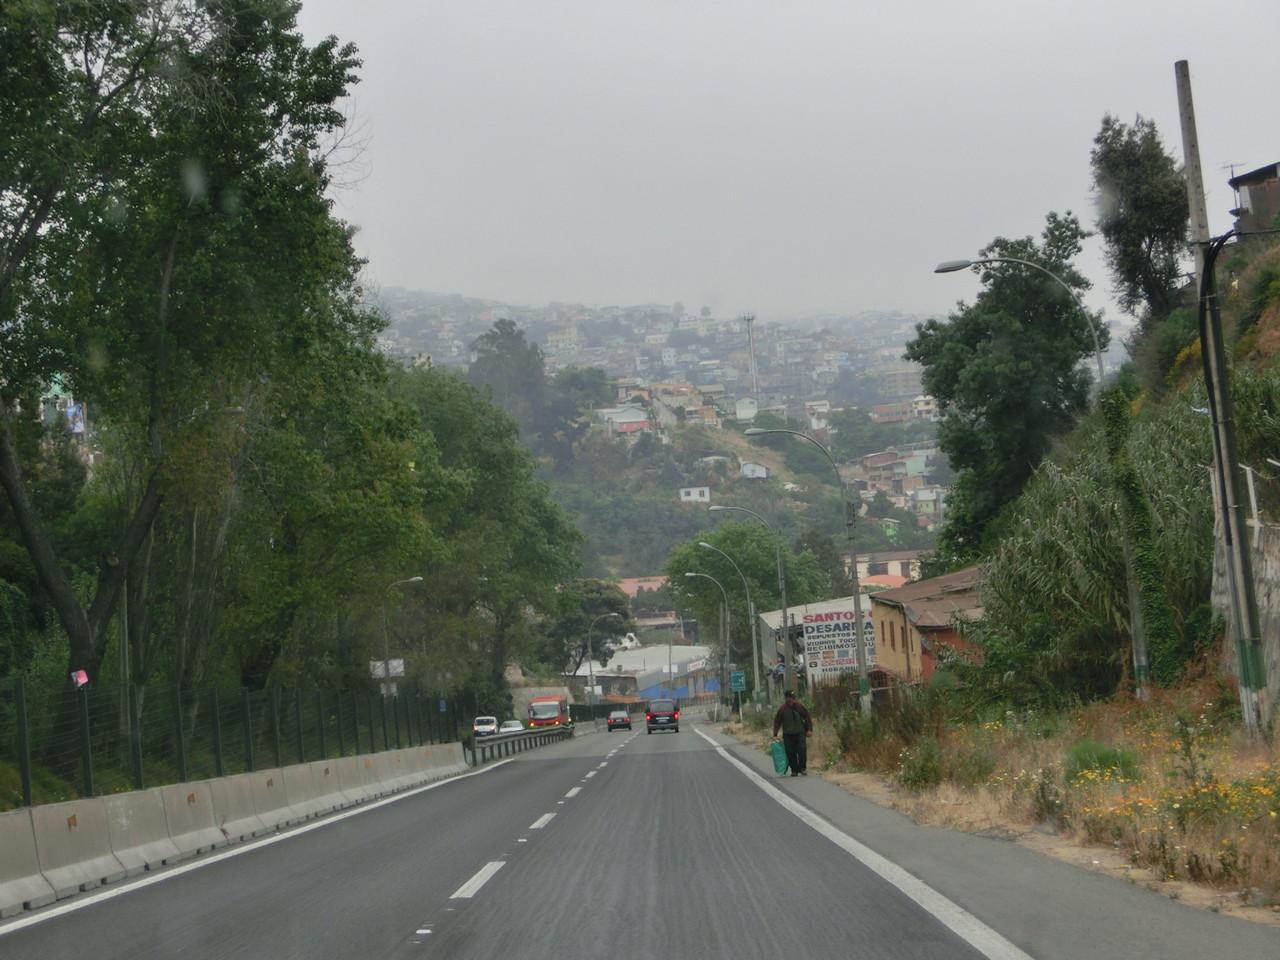 Valparaiso empfängt uns frio y nebuloso